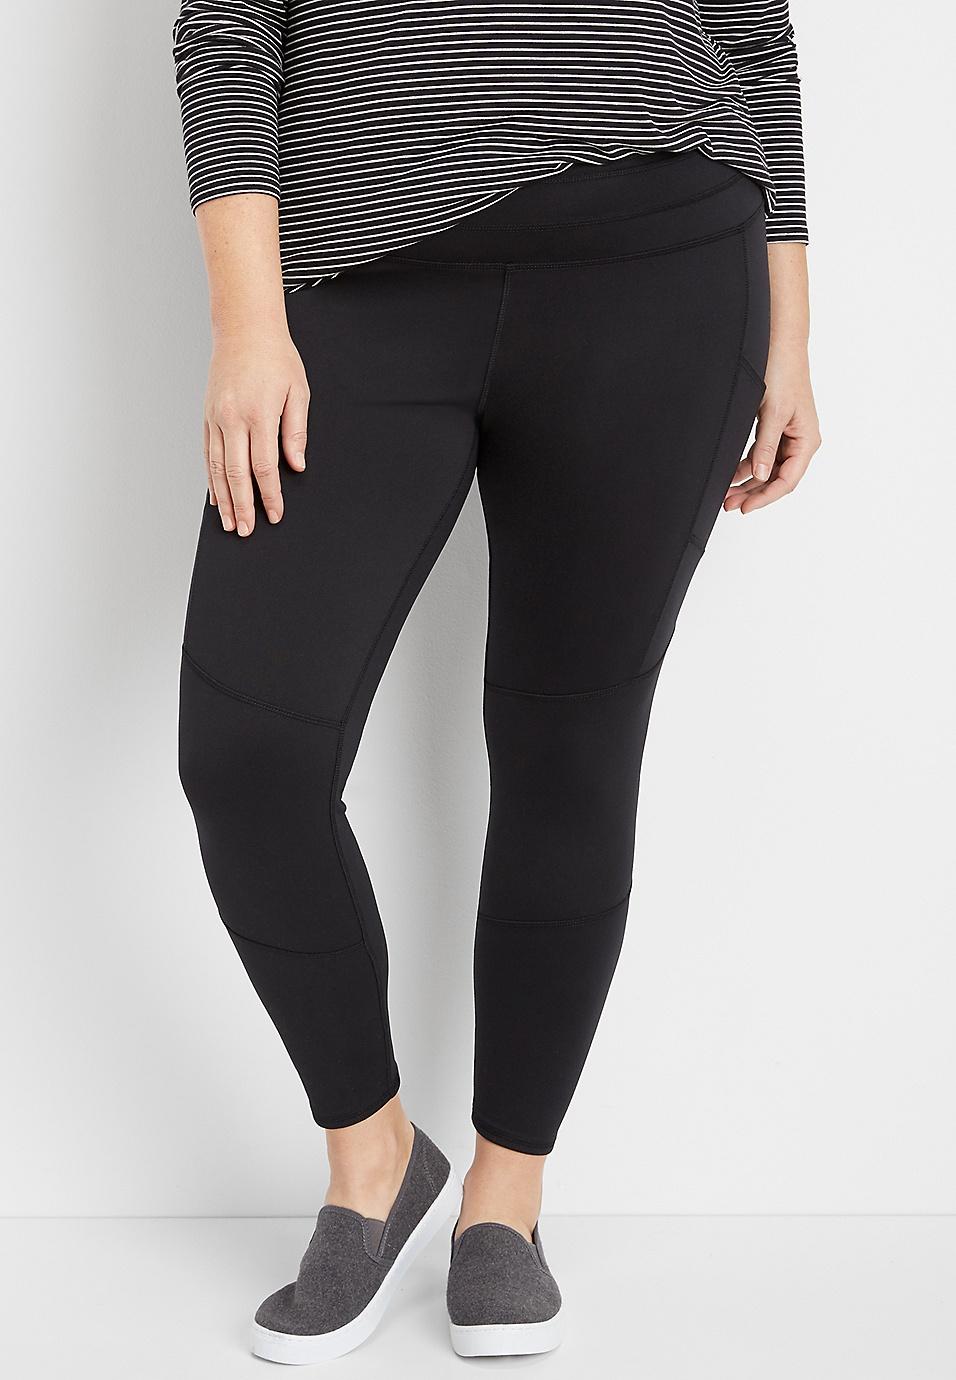 d7f31065eb332 plus size black 7/8 pocket active legging | maurices